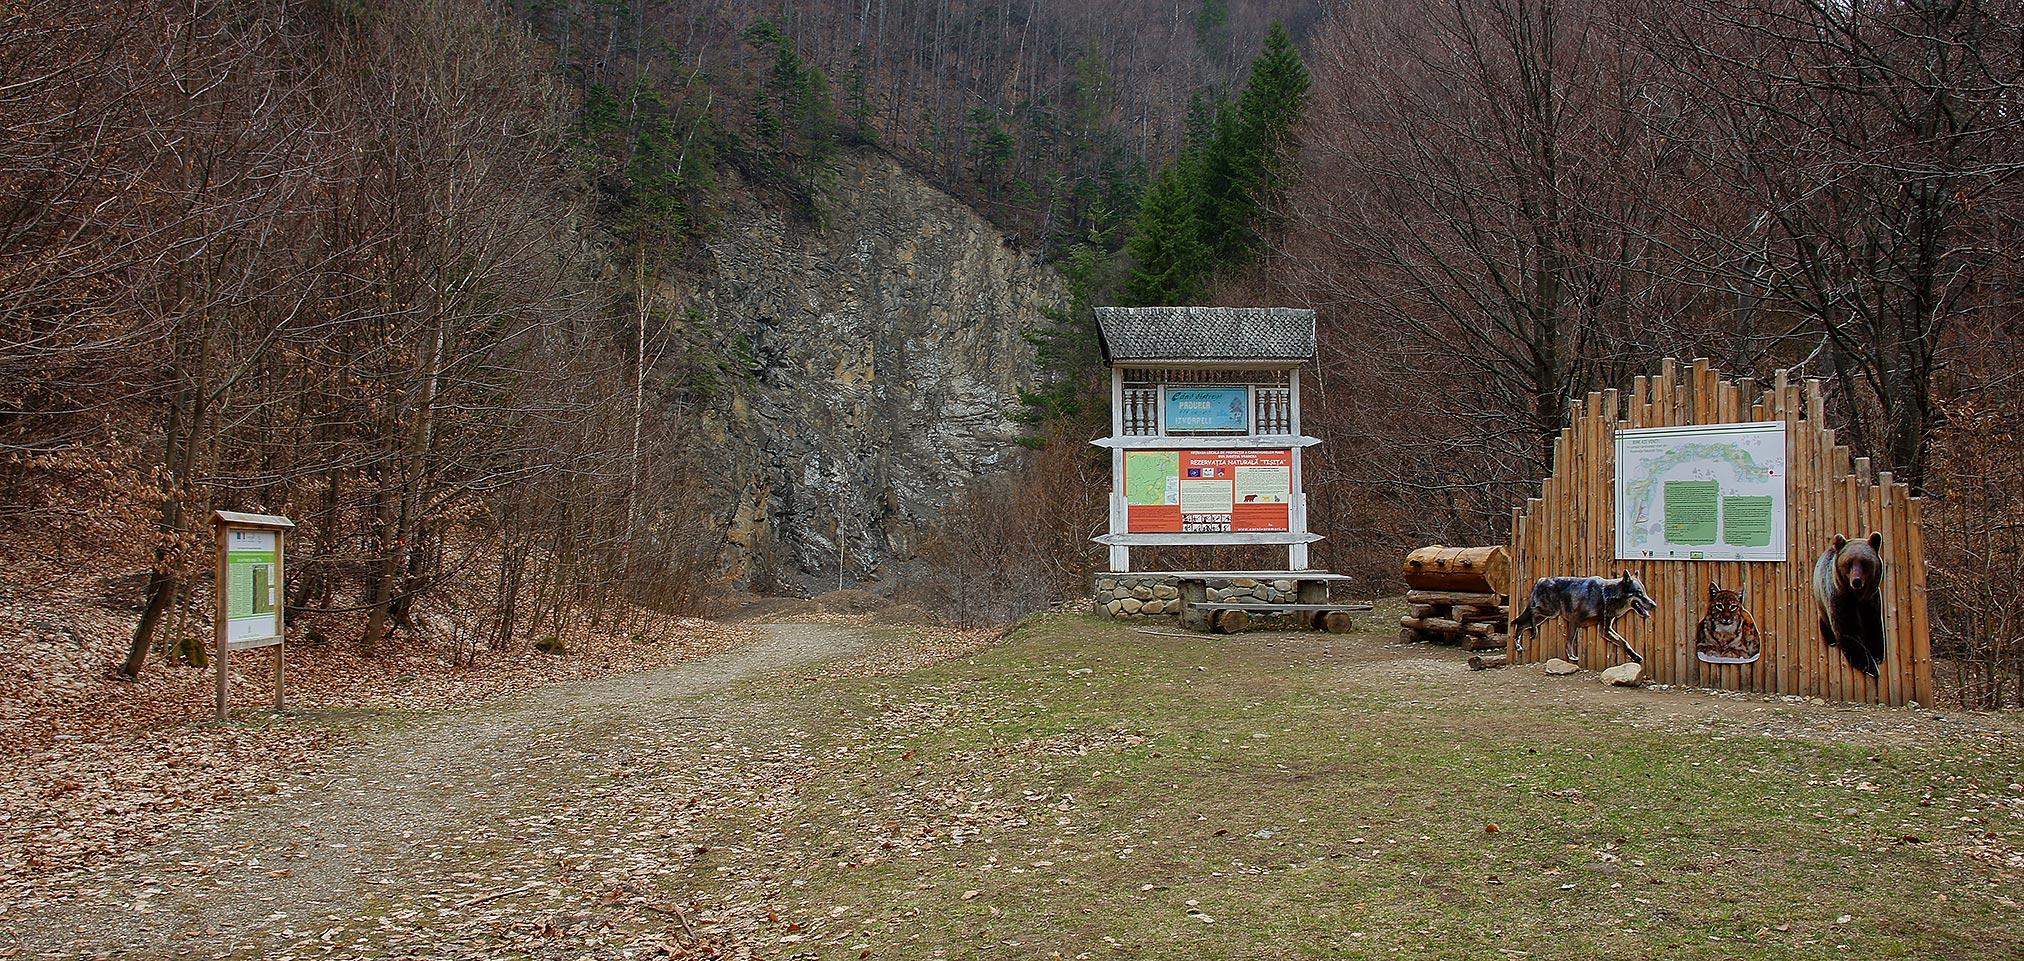 Wąwóz (Cheile) Tișiței – Góry Vrancei